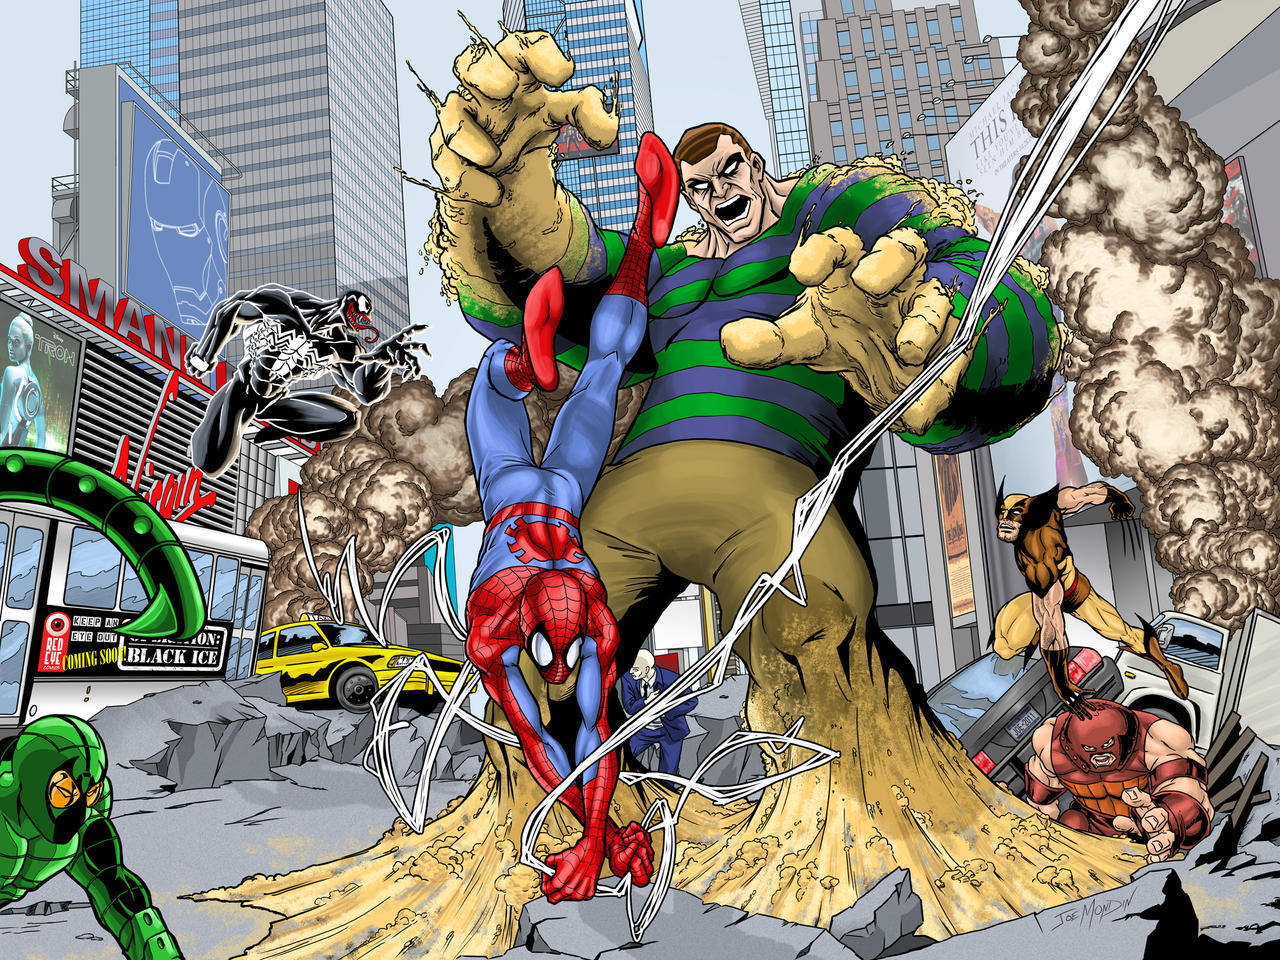 Spiderman Vs Sandman by JoeGrafix on DeviantArt